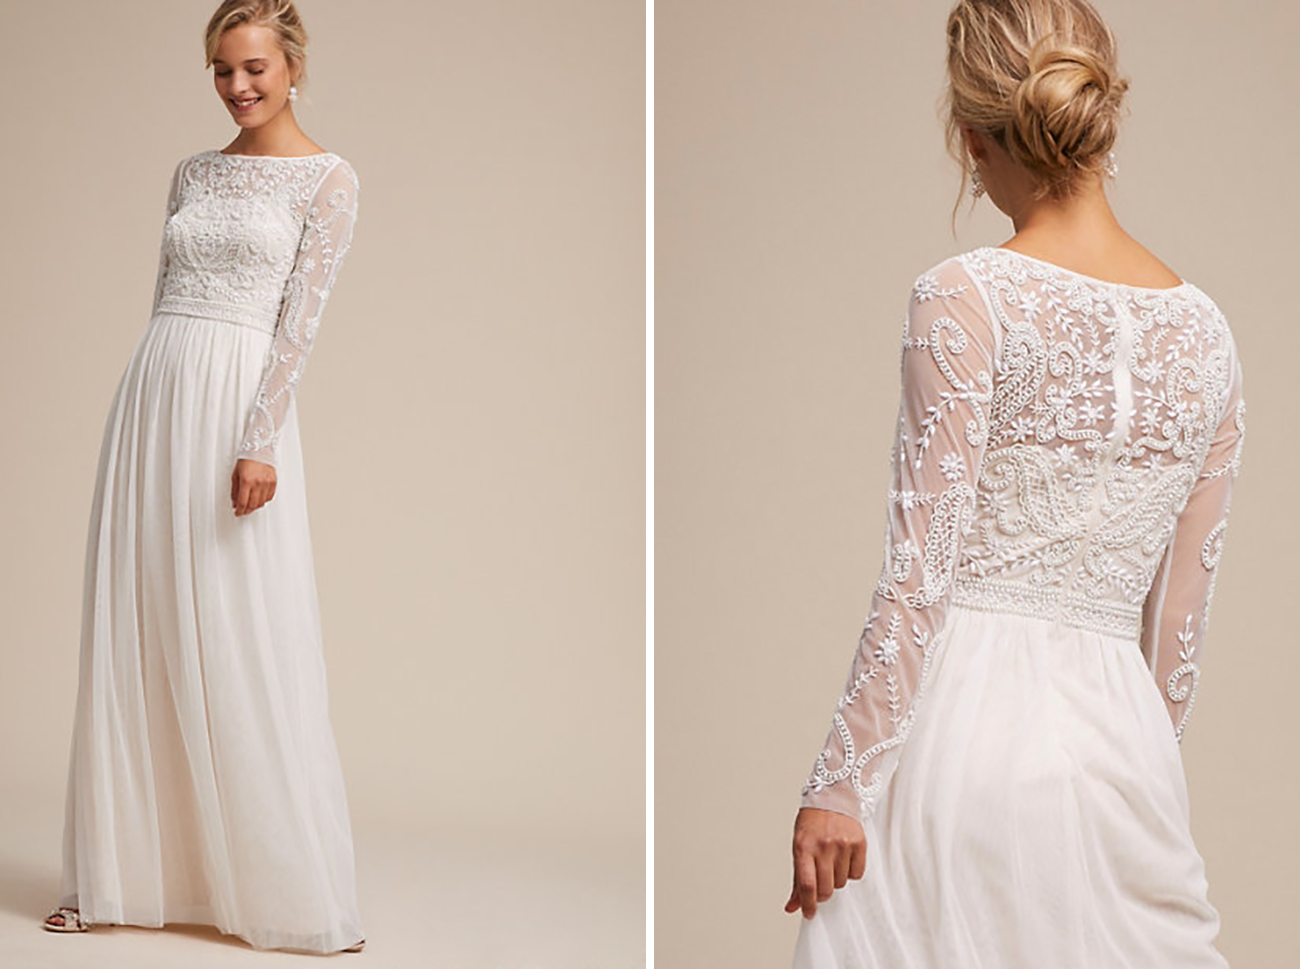 BHLDN Boho Chic Modern Lace Wedding Dress Under $800 Budget